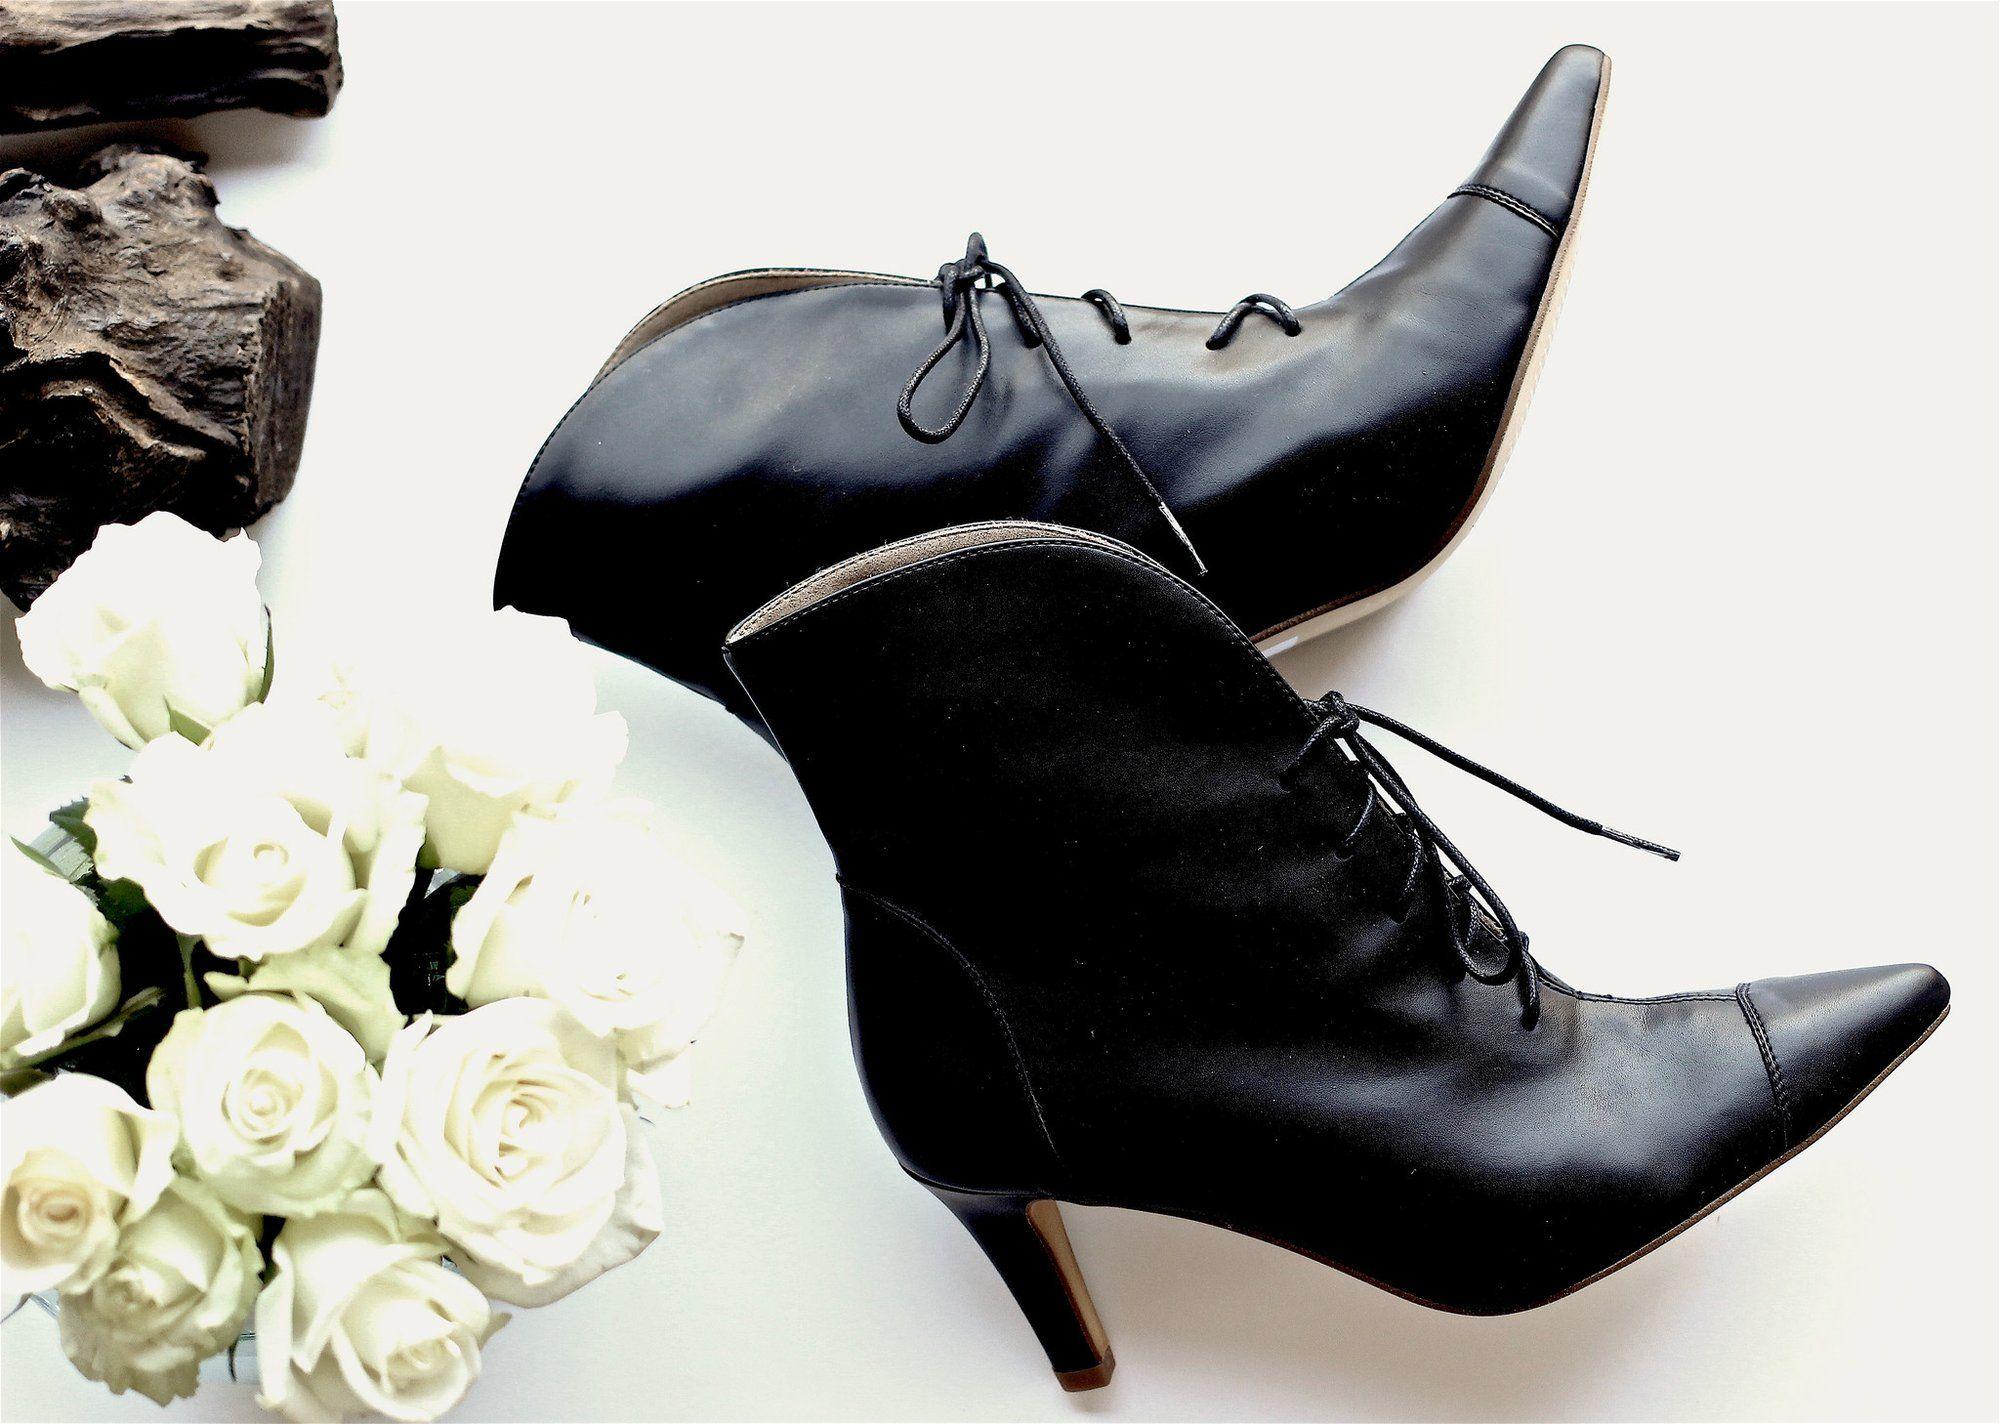 Paris Lace-Up Heel Bootie - BHAVA NY